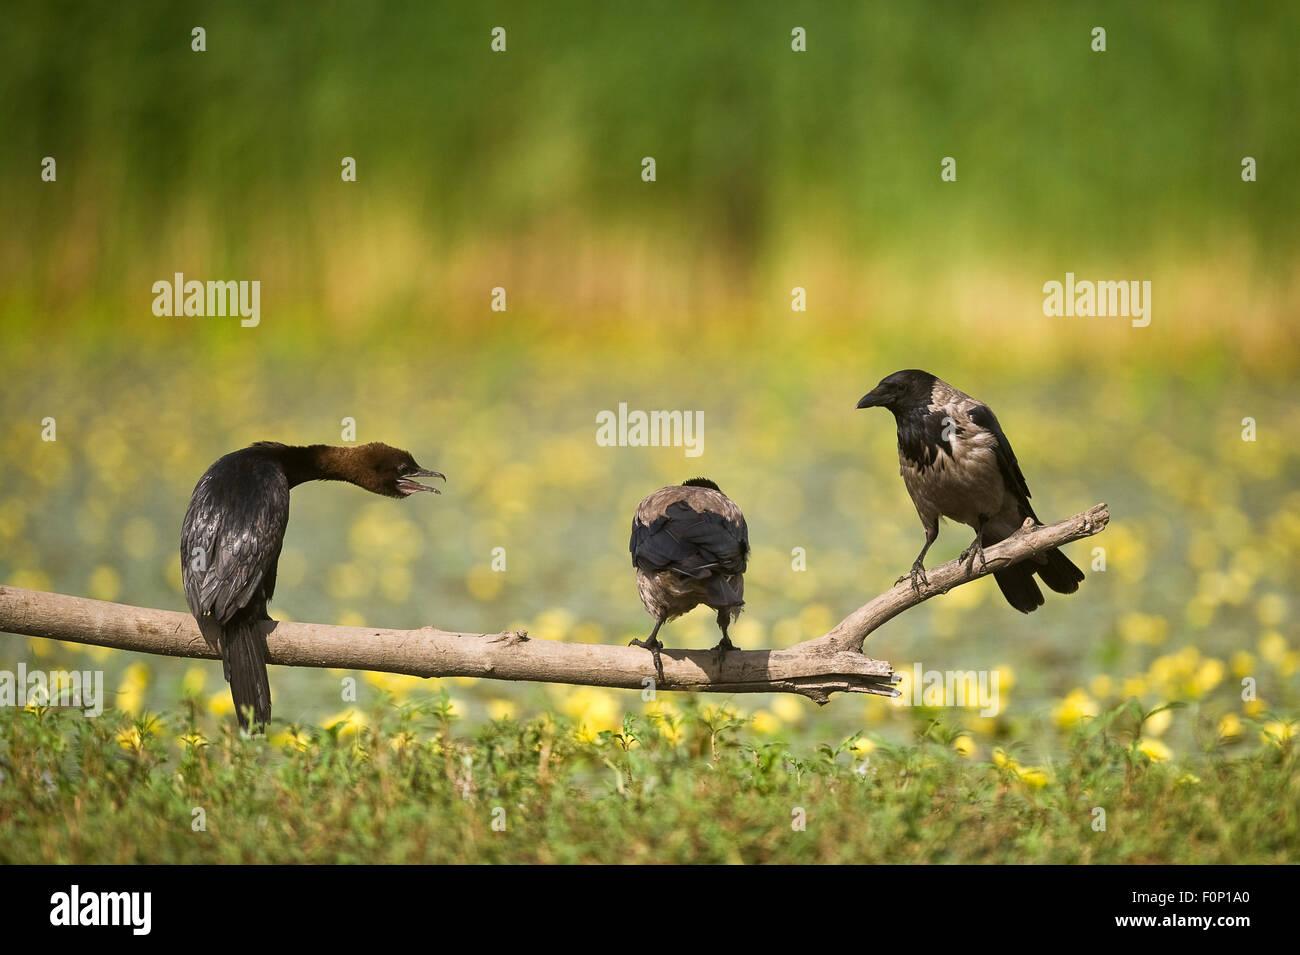 Pygmy cormorant (Phalacrocorax pygmeus) and two Hooded crows (Corvus cornix) on a branch, Hortobagy National Park, - Stock Image